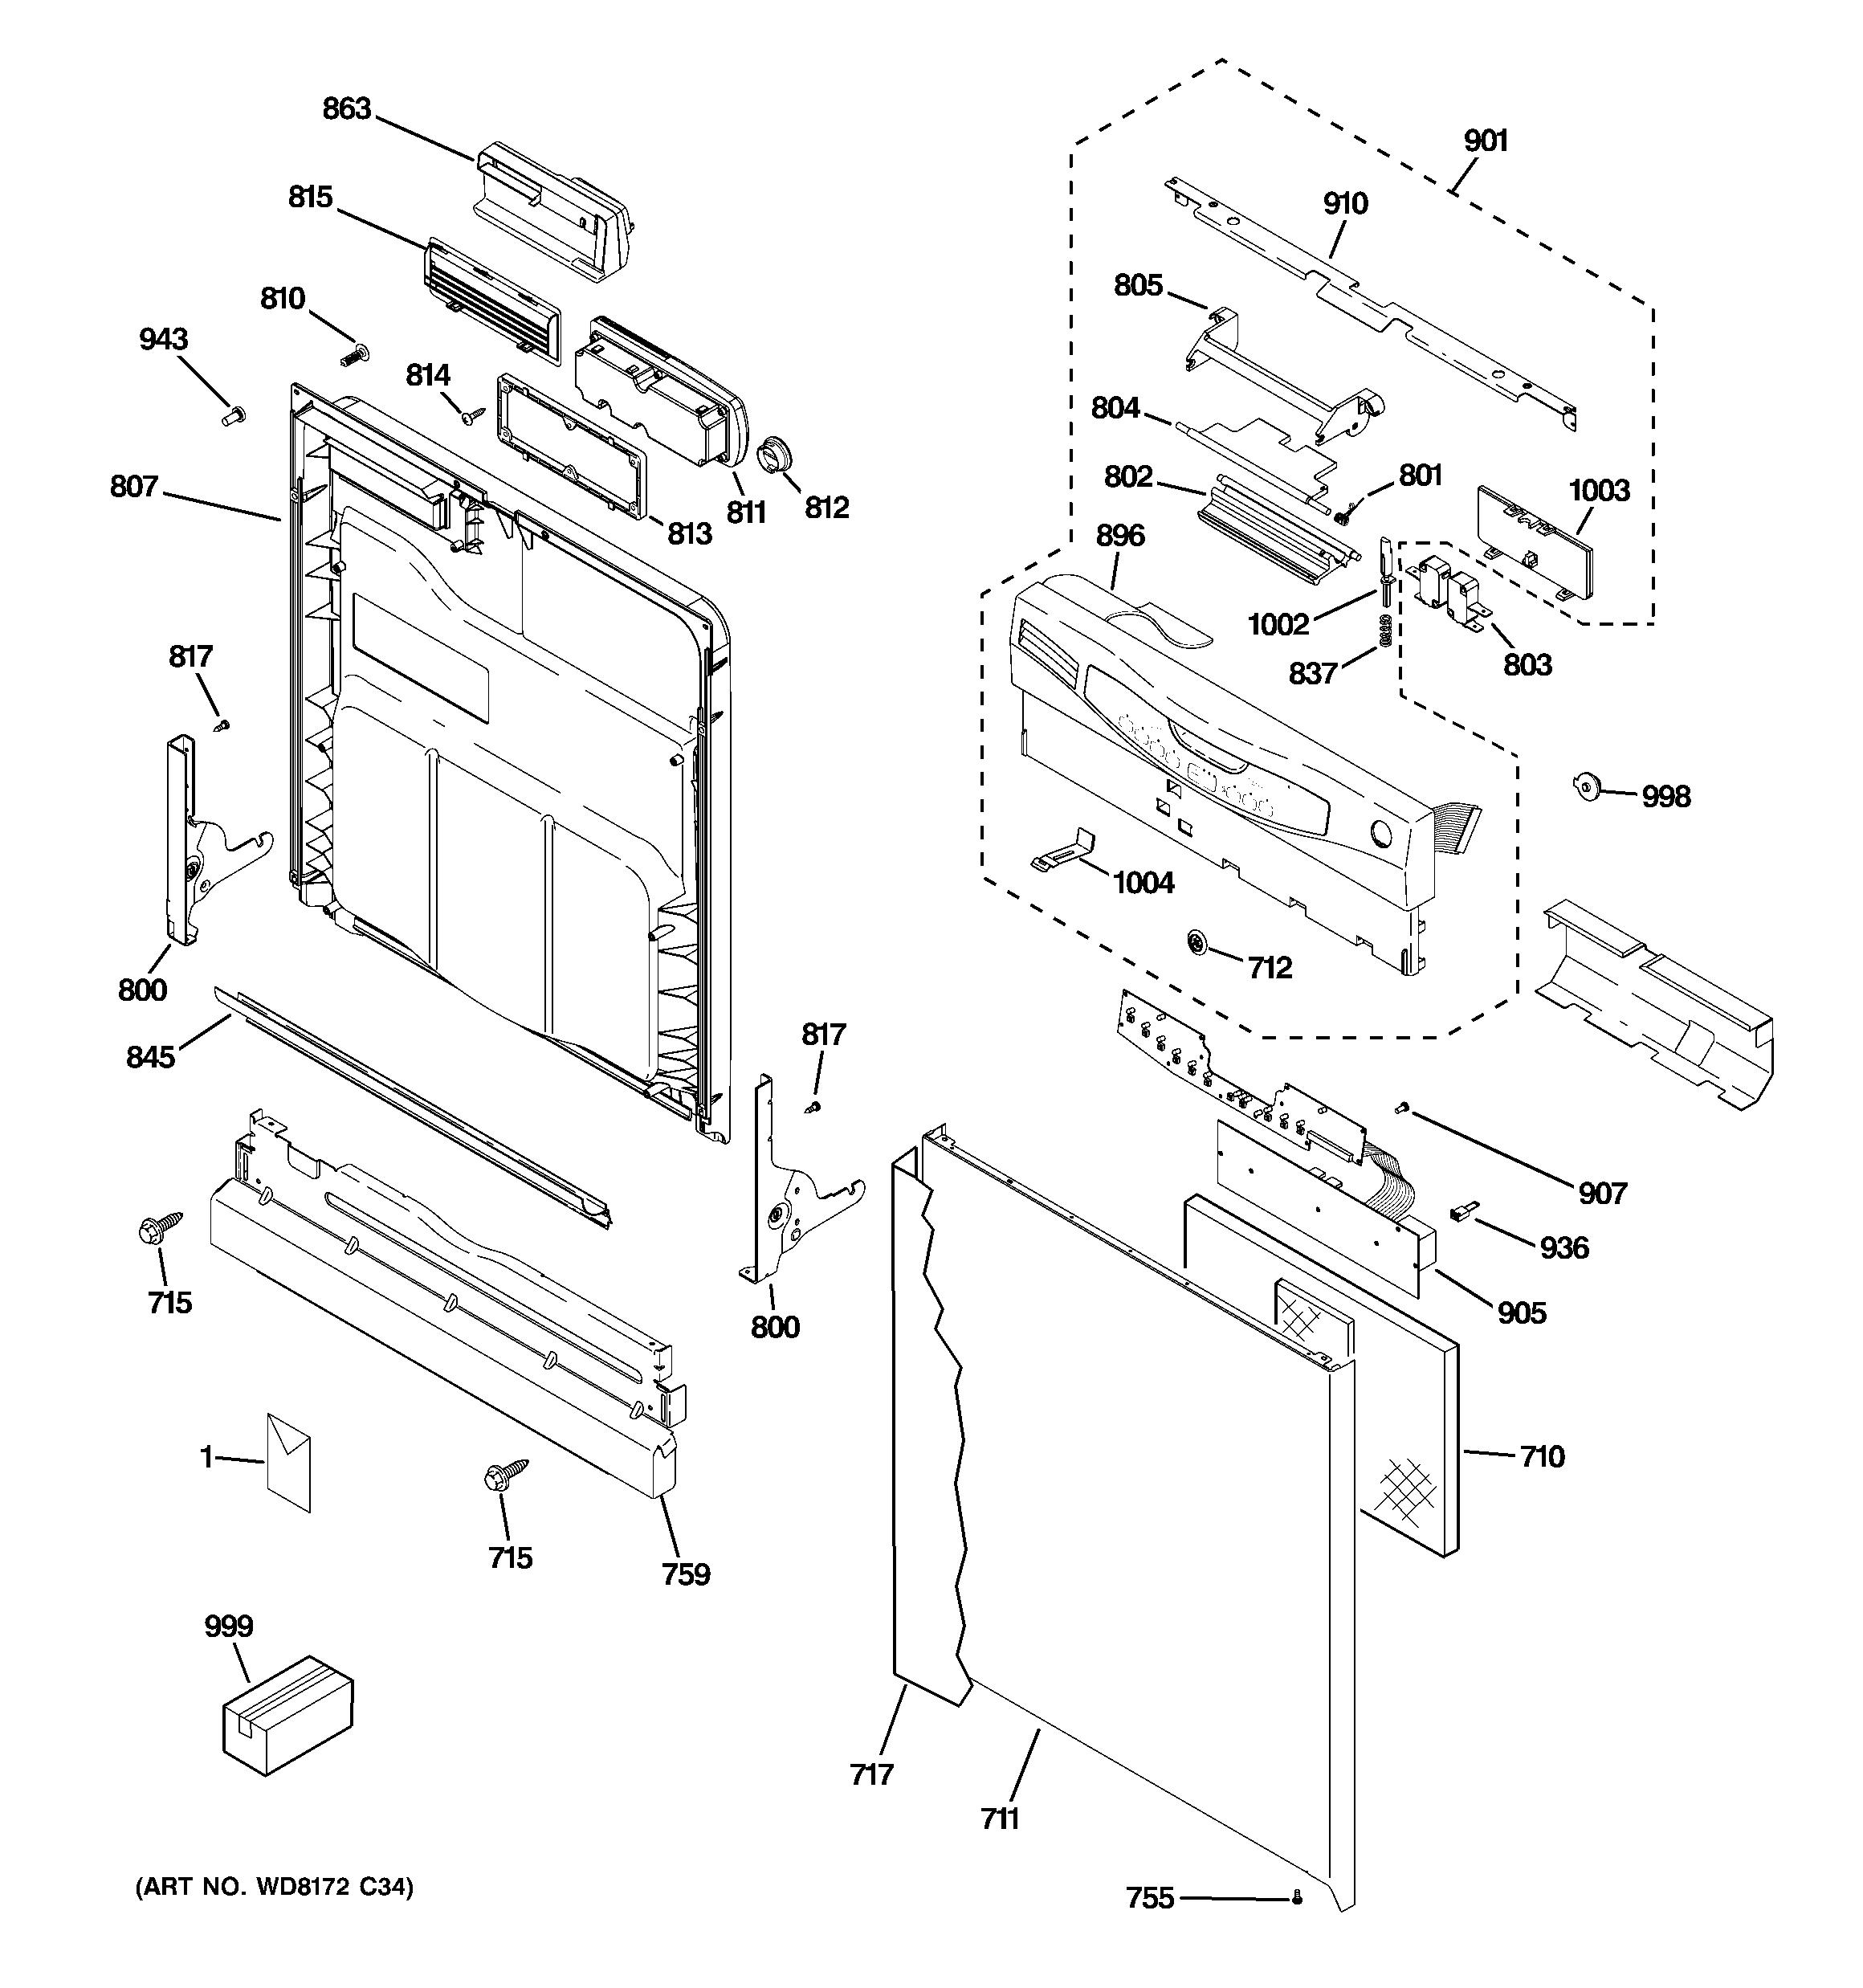 Ge Model Gld5600V00Ww Dishwasher Genuine Parts - Ge Refrigerator Wiring Diagram